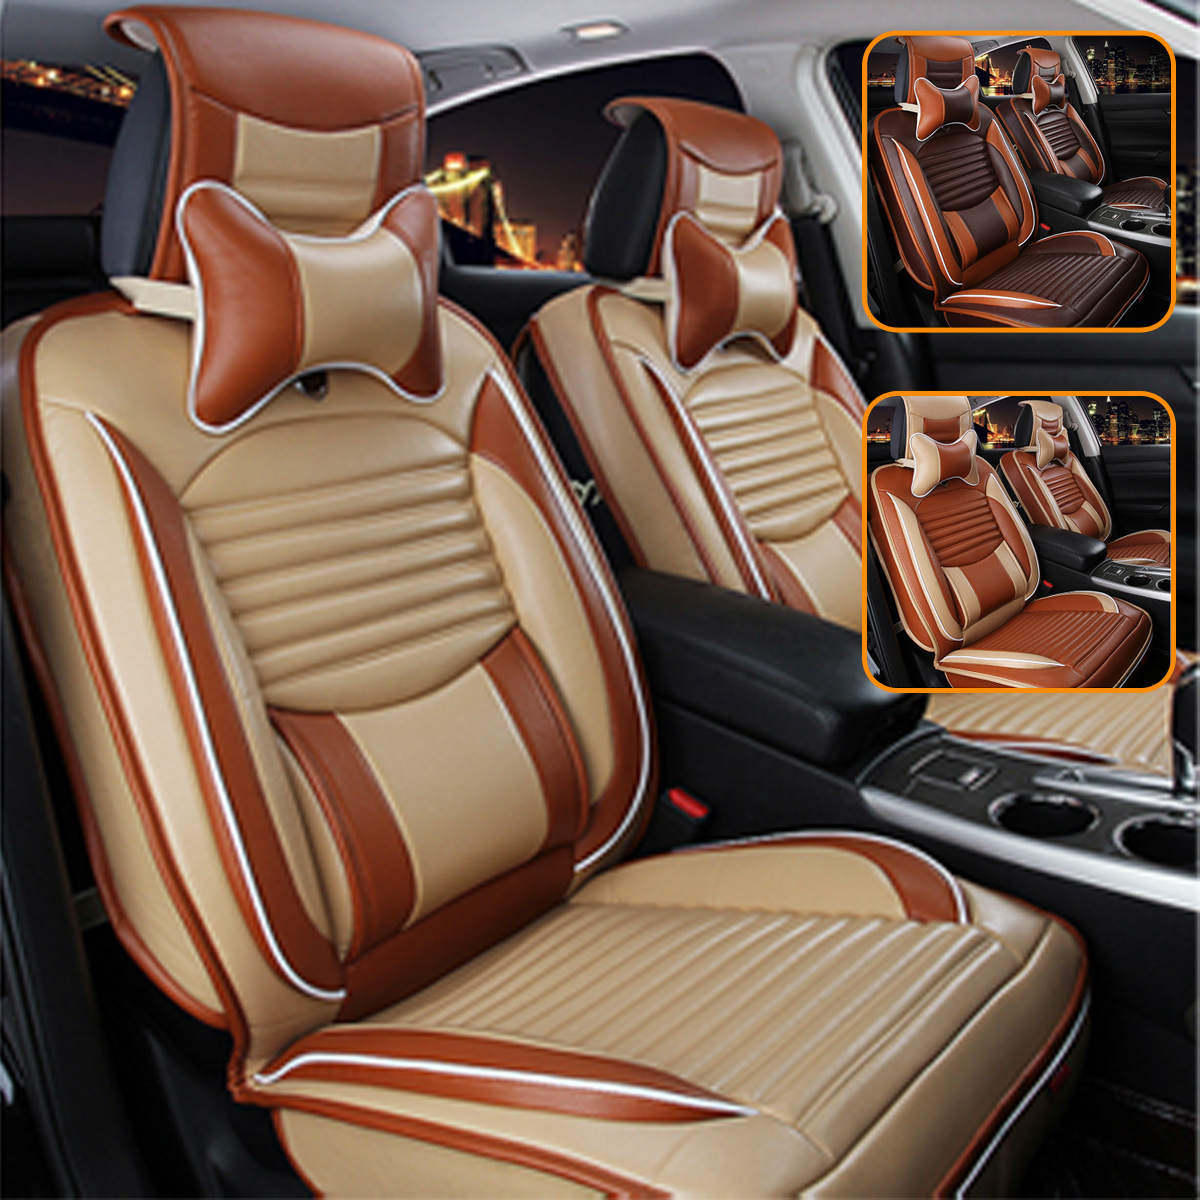 13Pcs Universal car seat set 5 Seat Car PU Leather Full Surround Cover Cushion + Pillows Trim Set